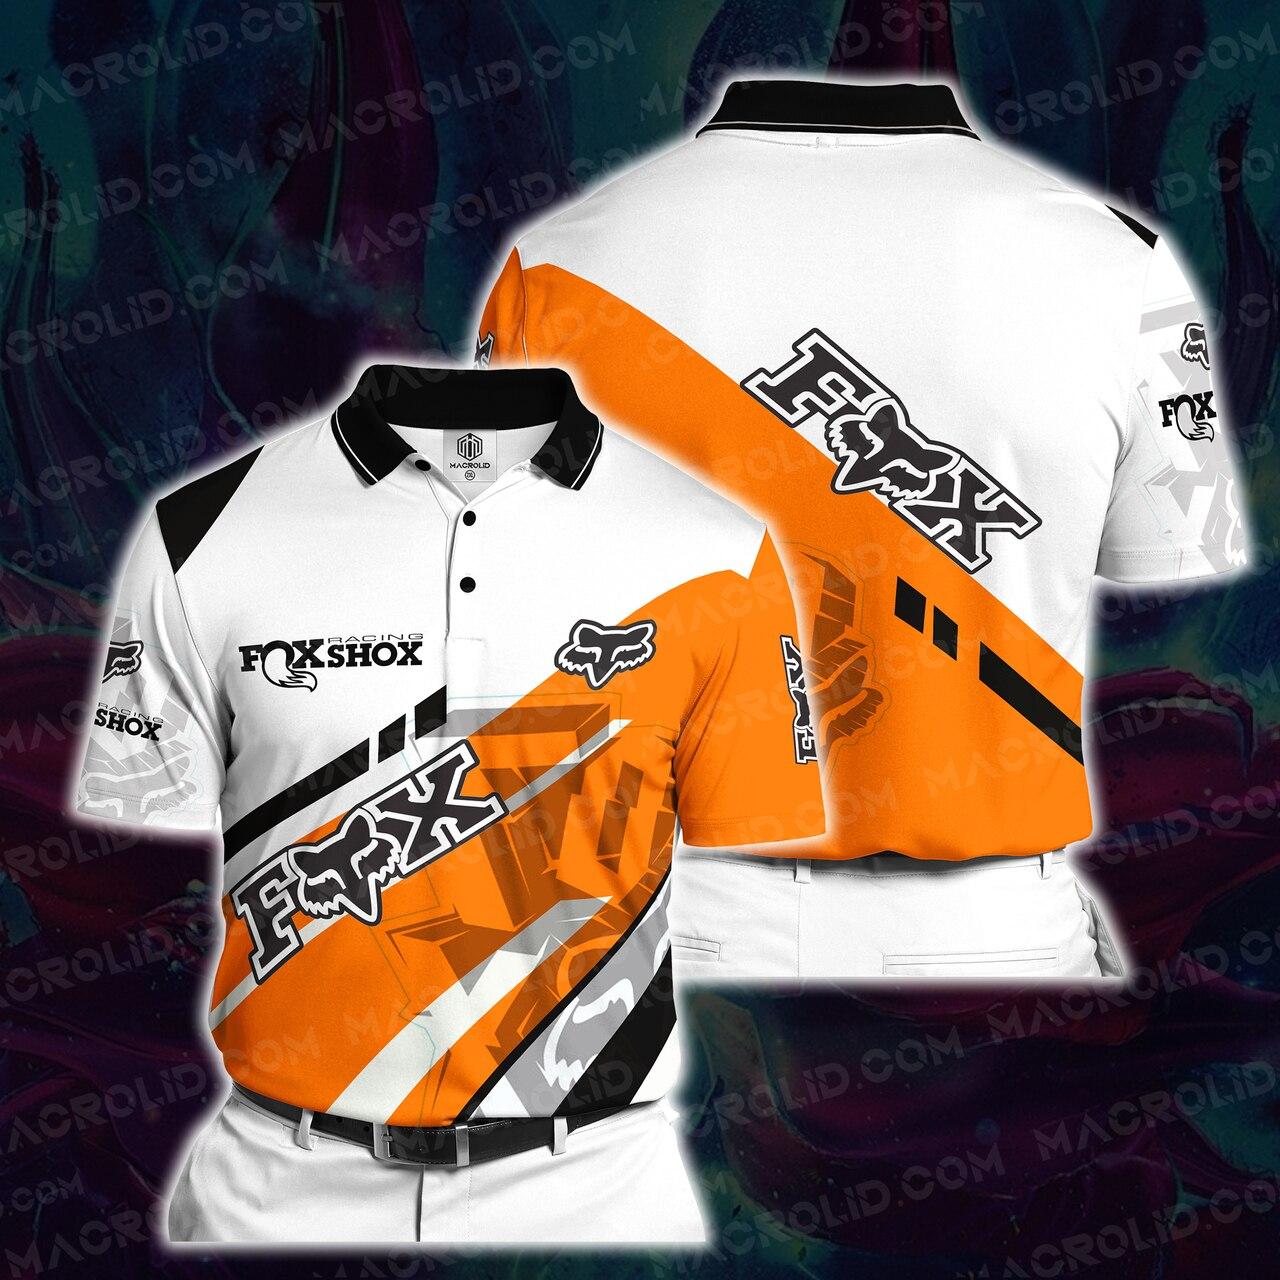 Fox racing motocross full printing polo